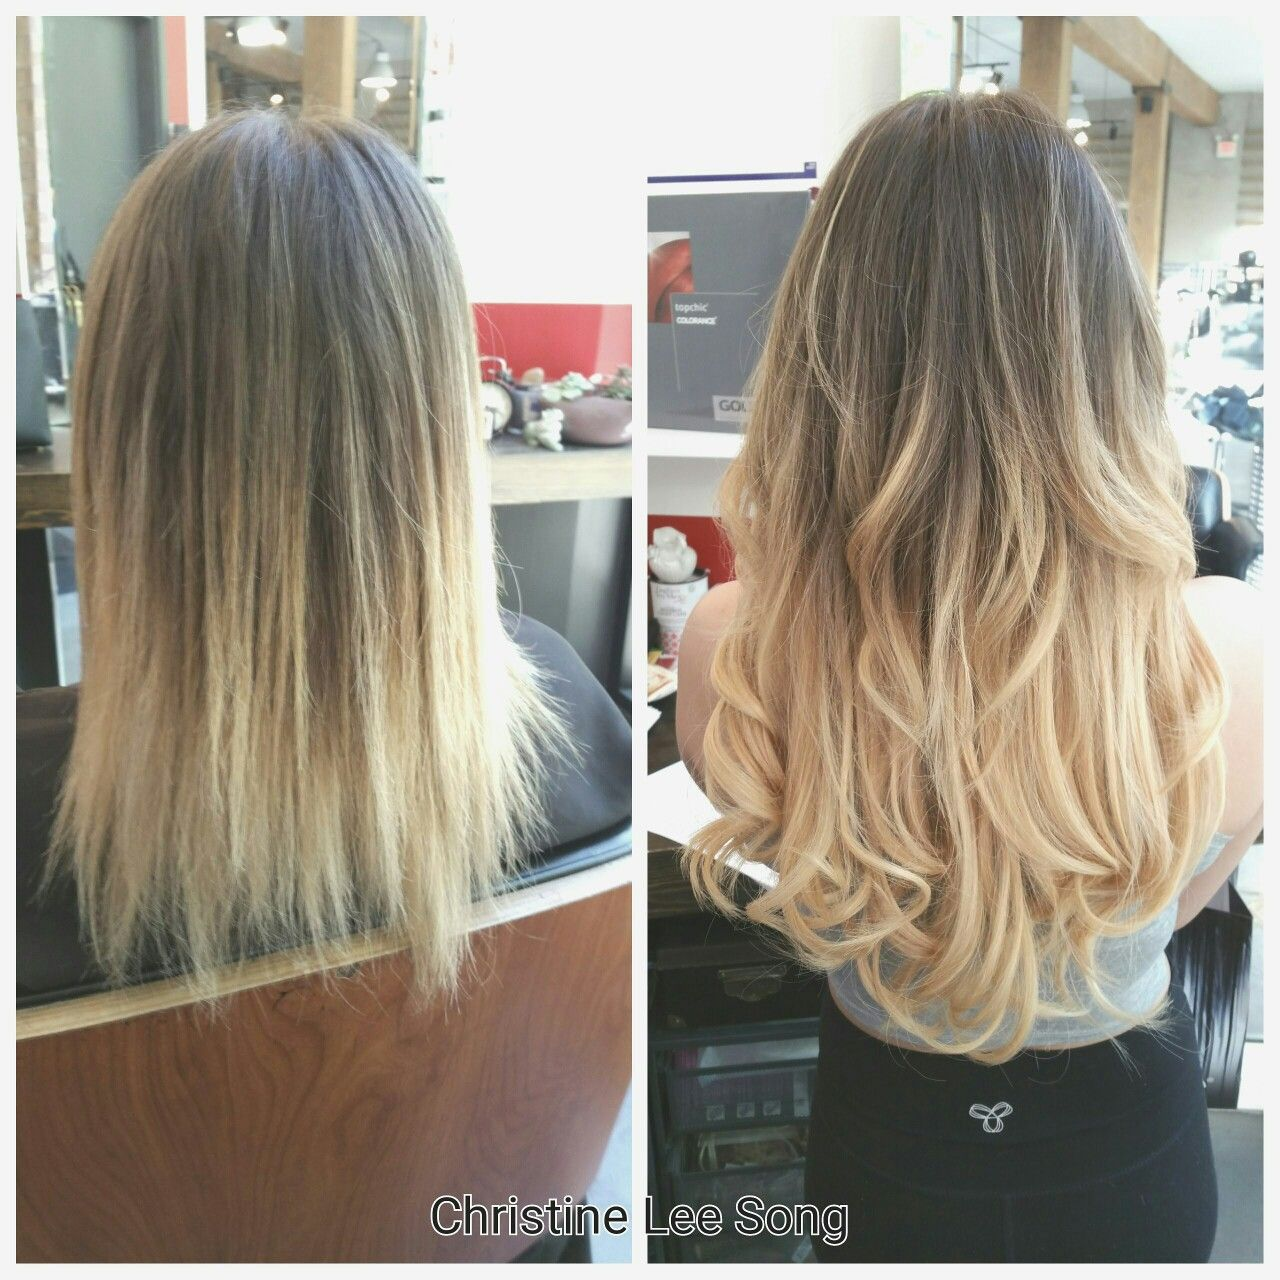 Individual prebonded keratin fusion hair extensions are